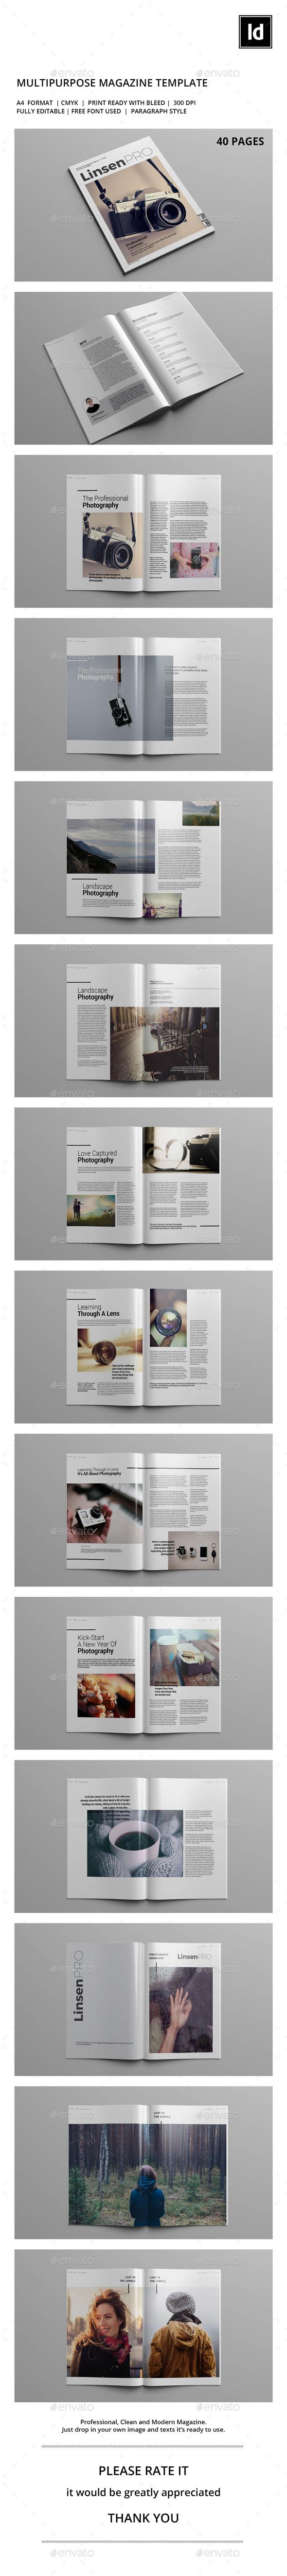 Linsen PRO Magazine Template - Magazines Print Templates